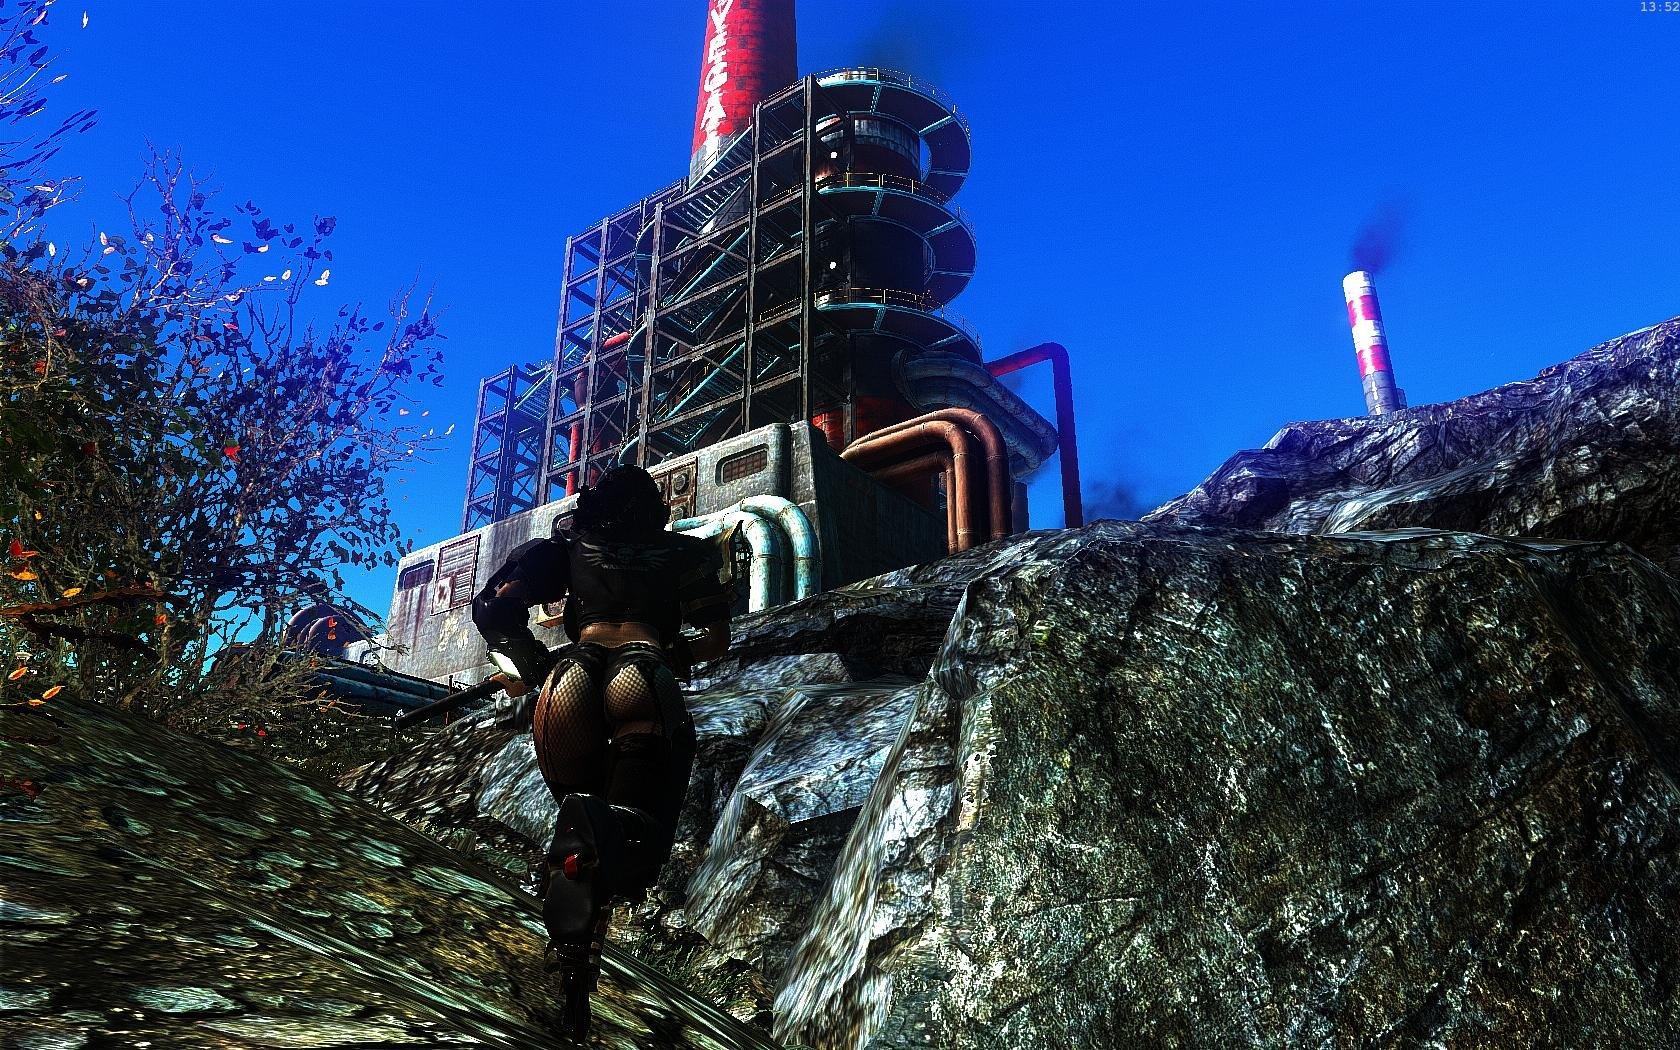 Fallout4 2019-01-19 13-52-11-80